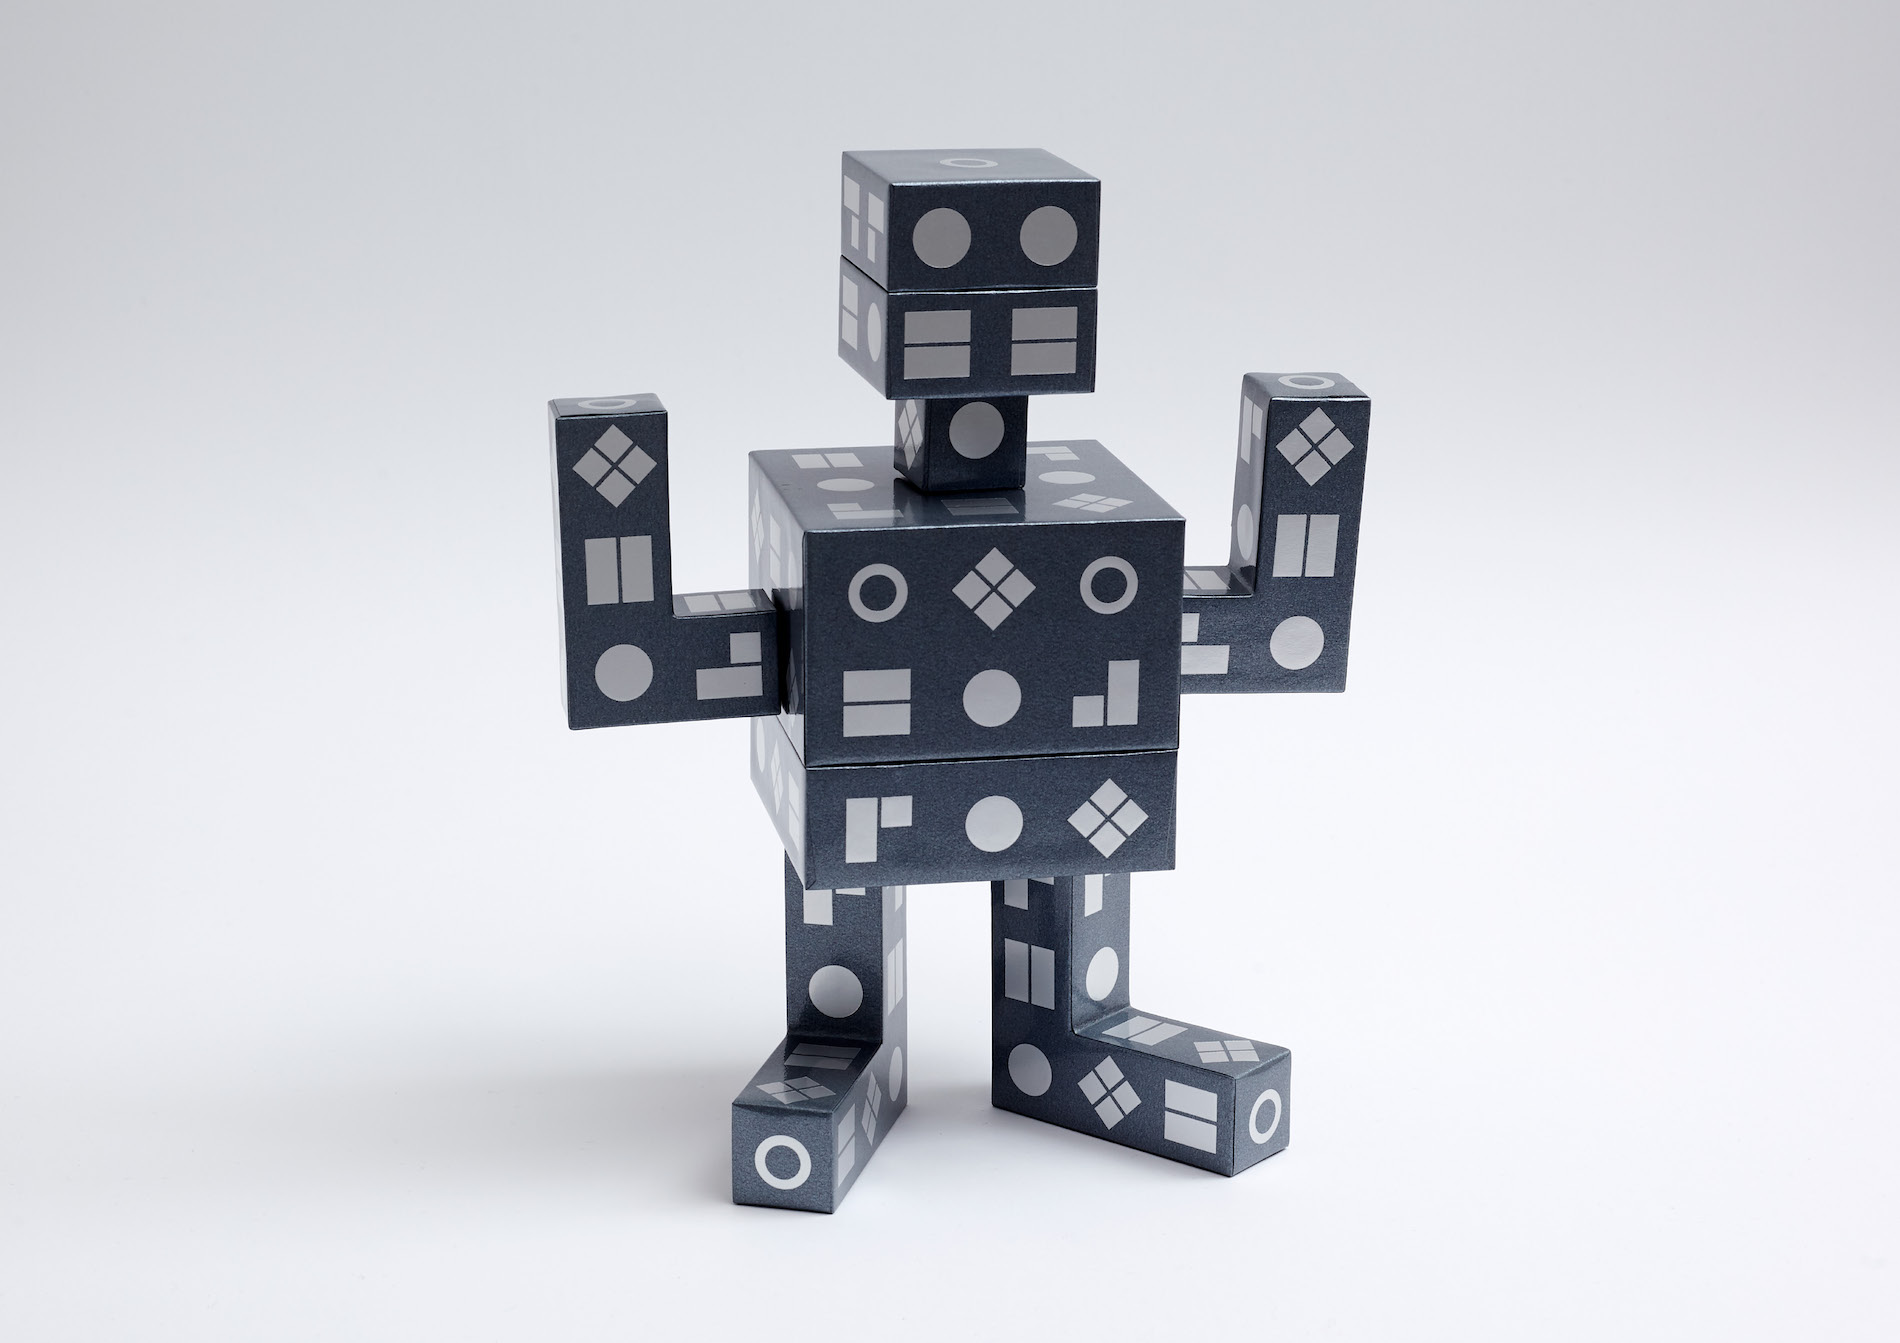 Robox: The Poseable Hot-Foil Robot! - PaperSpecs